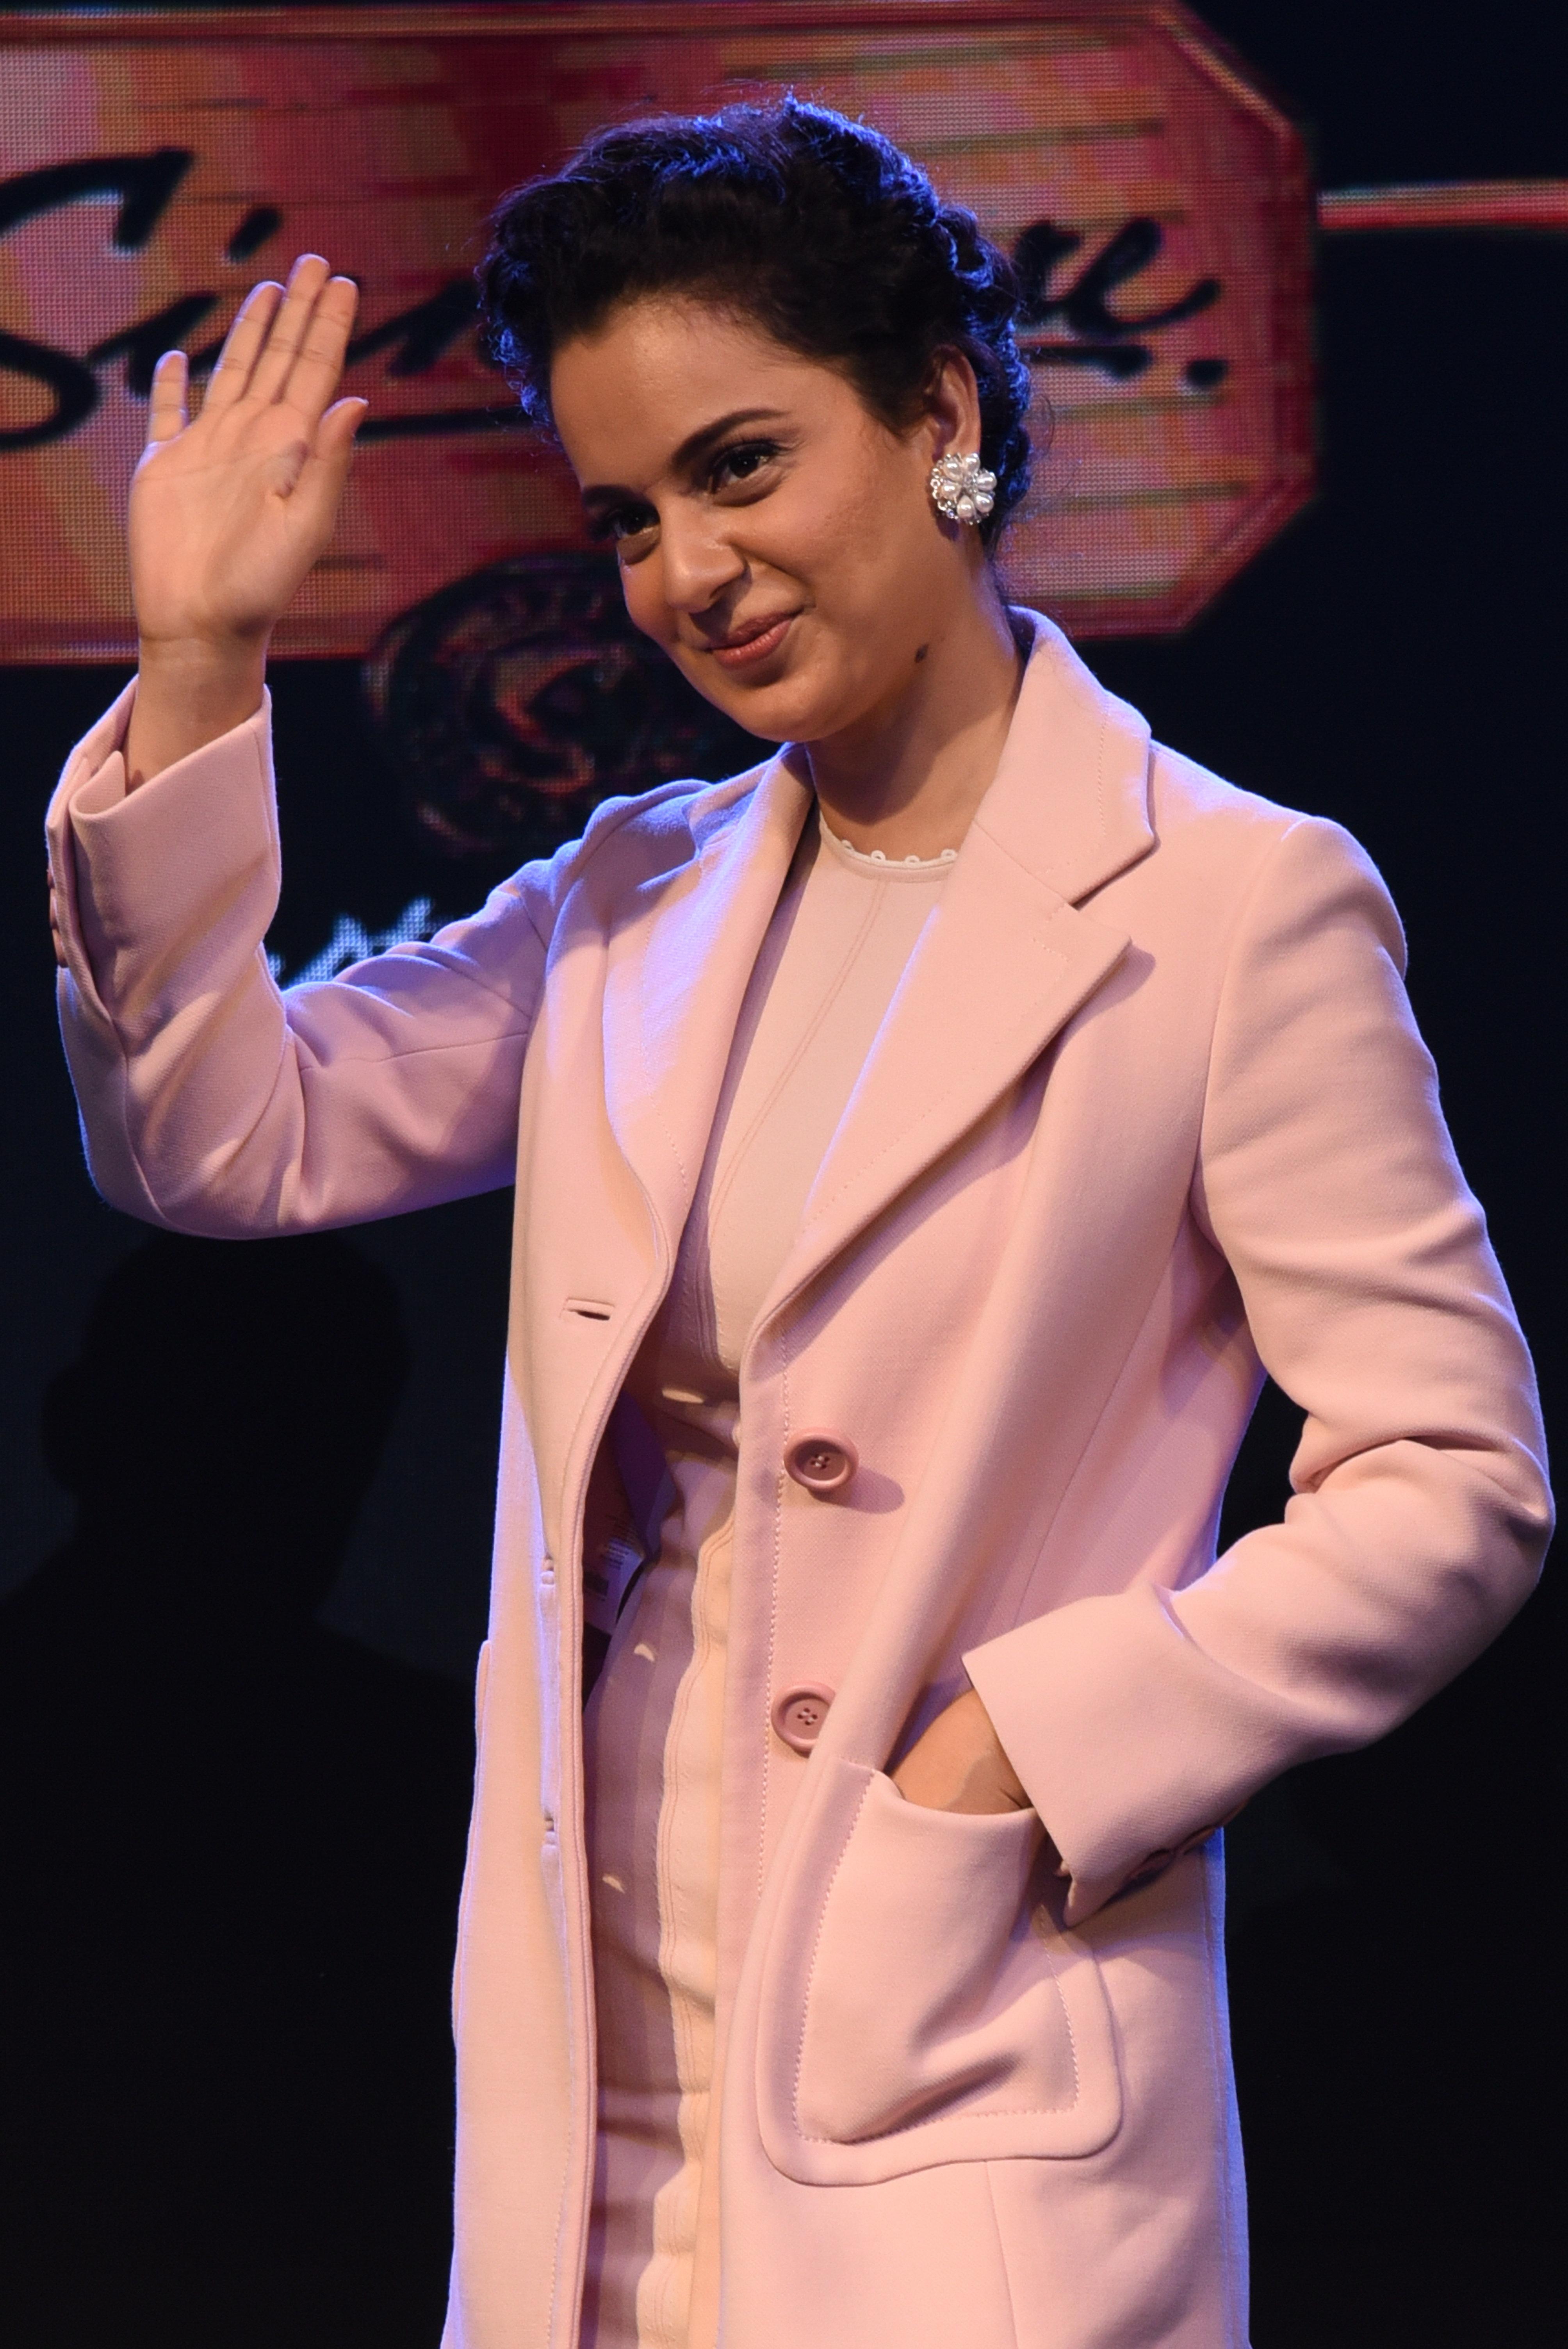 Stop Pampering Mediocrity, Says Kangana On Alia Bhatt's Gully Boy